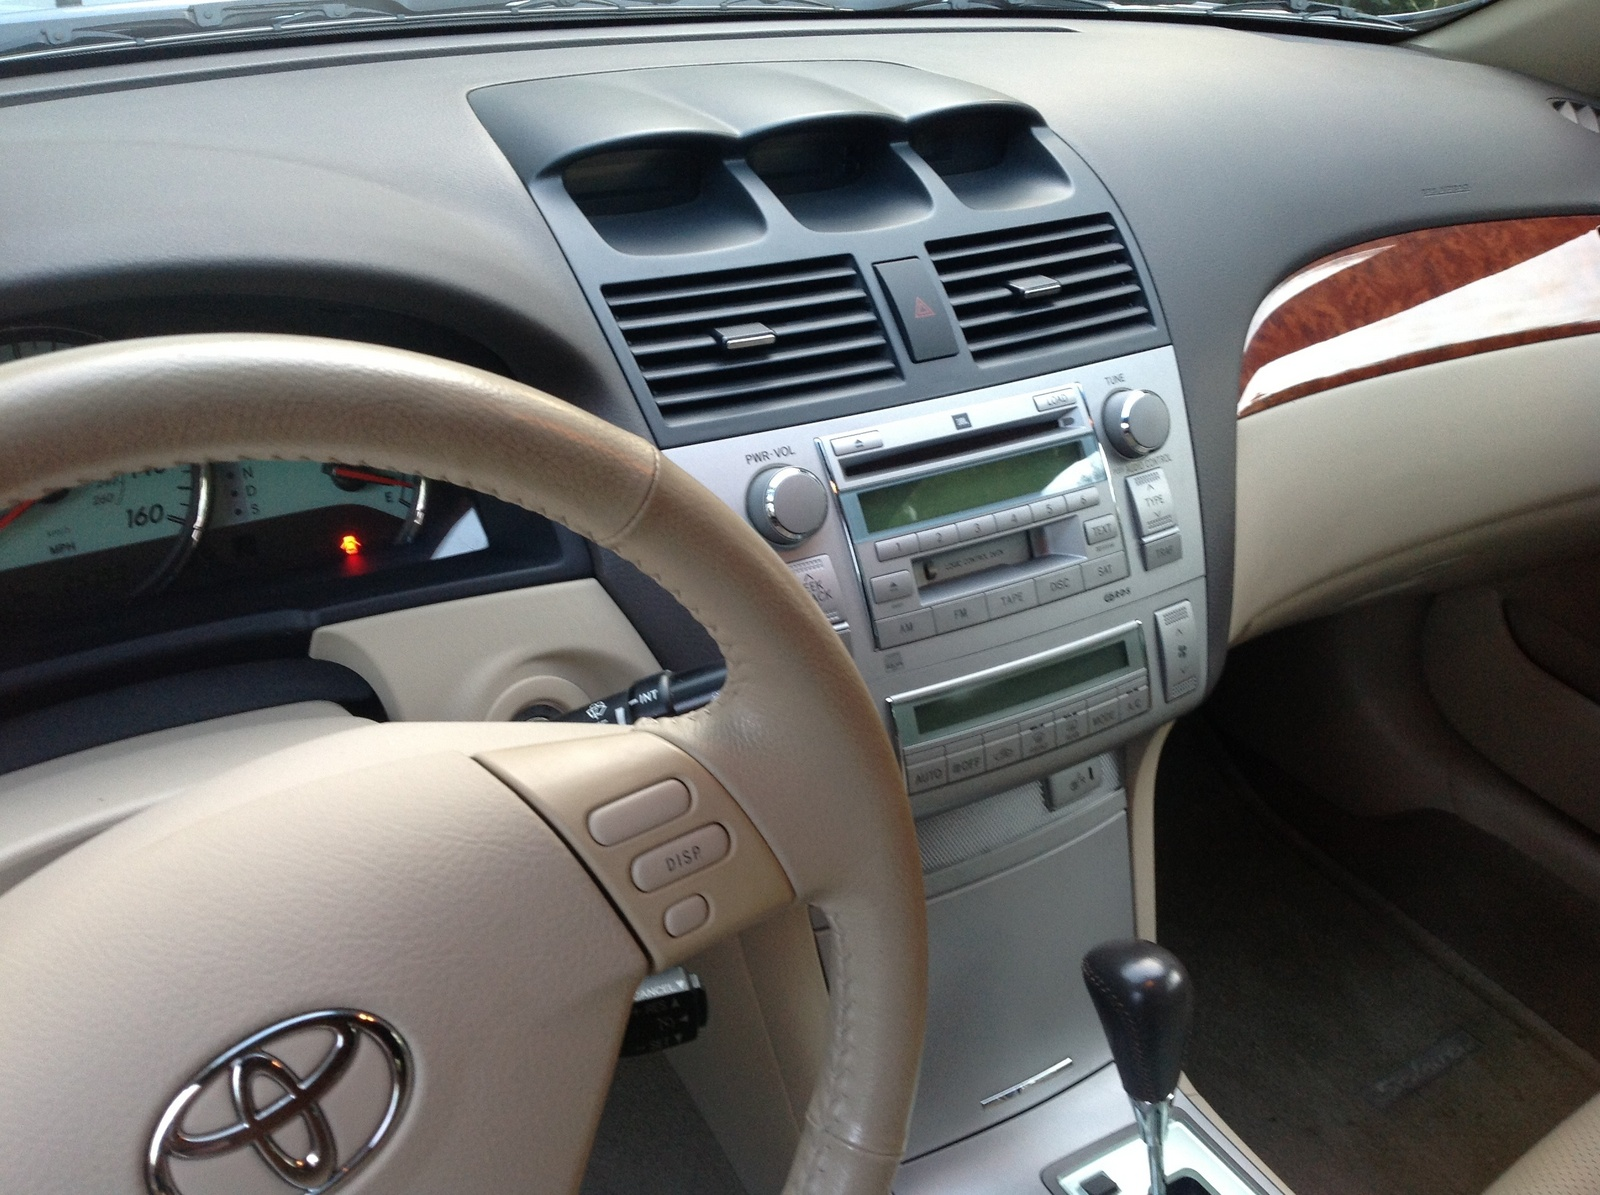 Honda Cars Of Corona >> 2006 Toyota Camry Solara - Interior Pictures - CarGurus